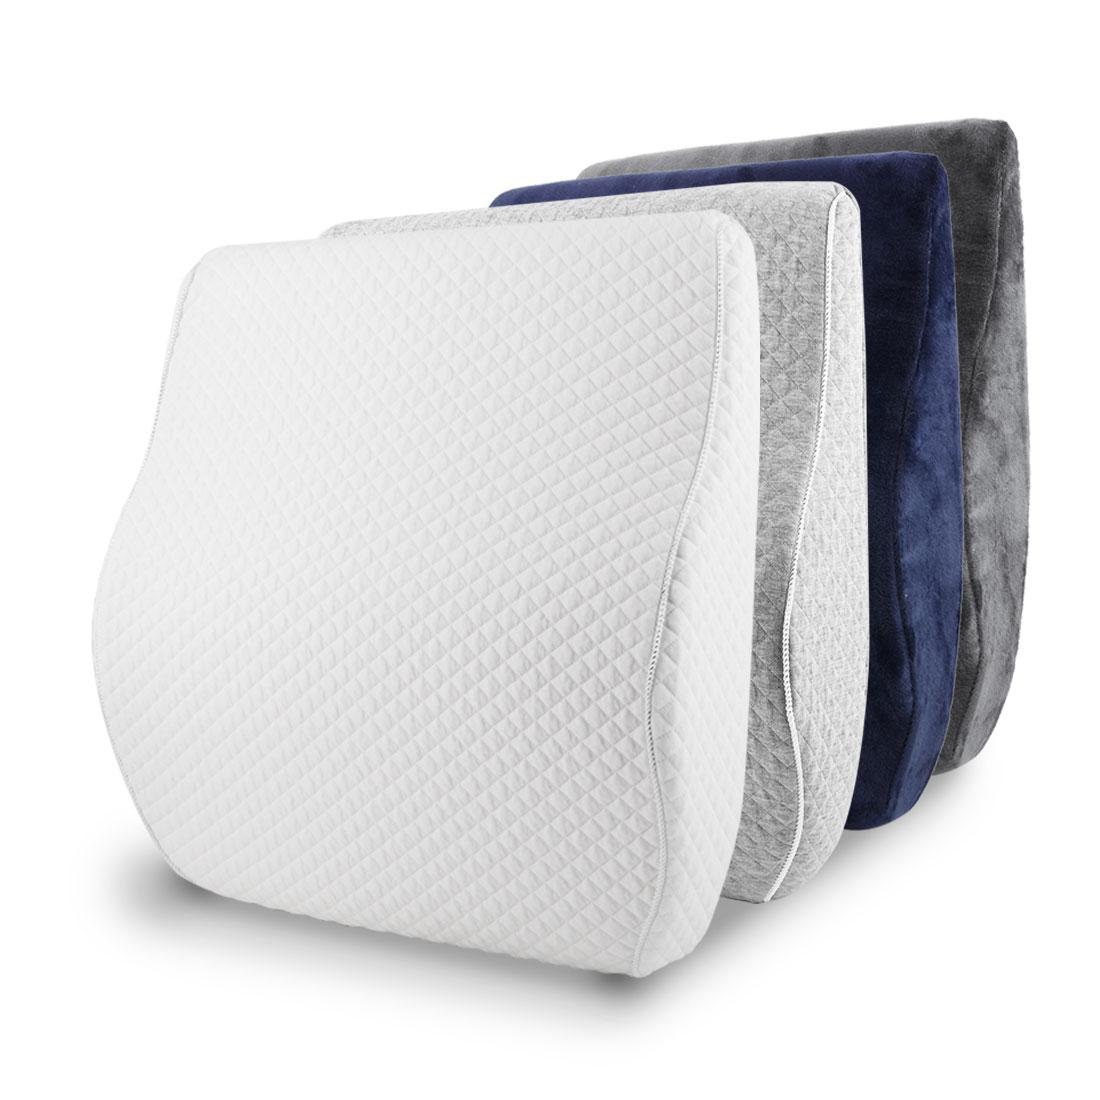 lumbar support memory foam lower back